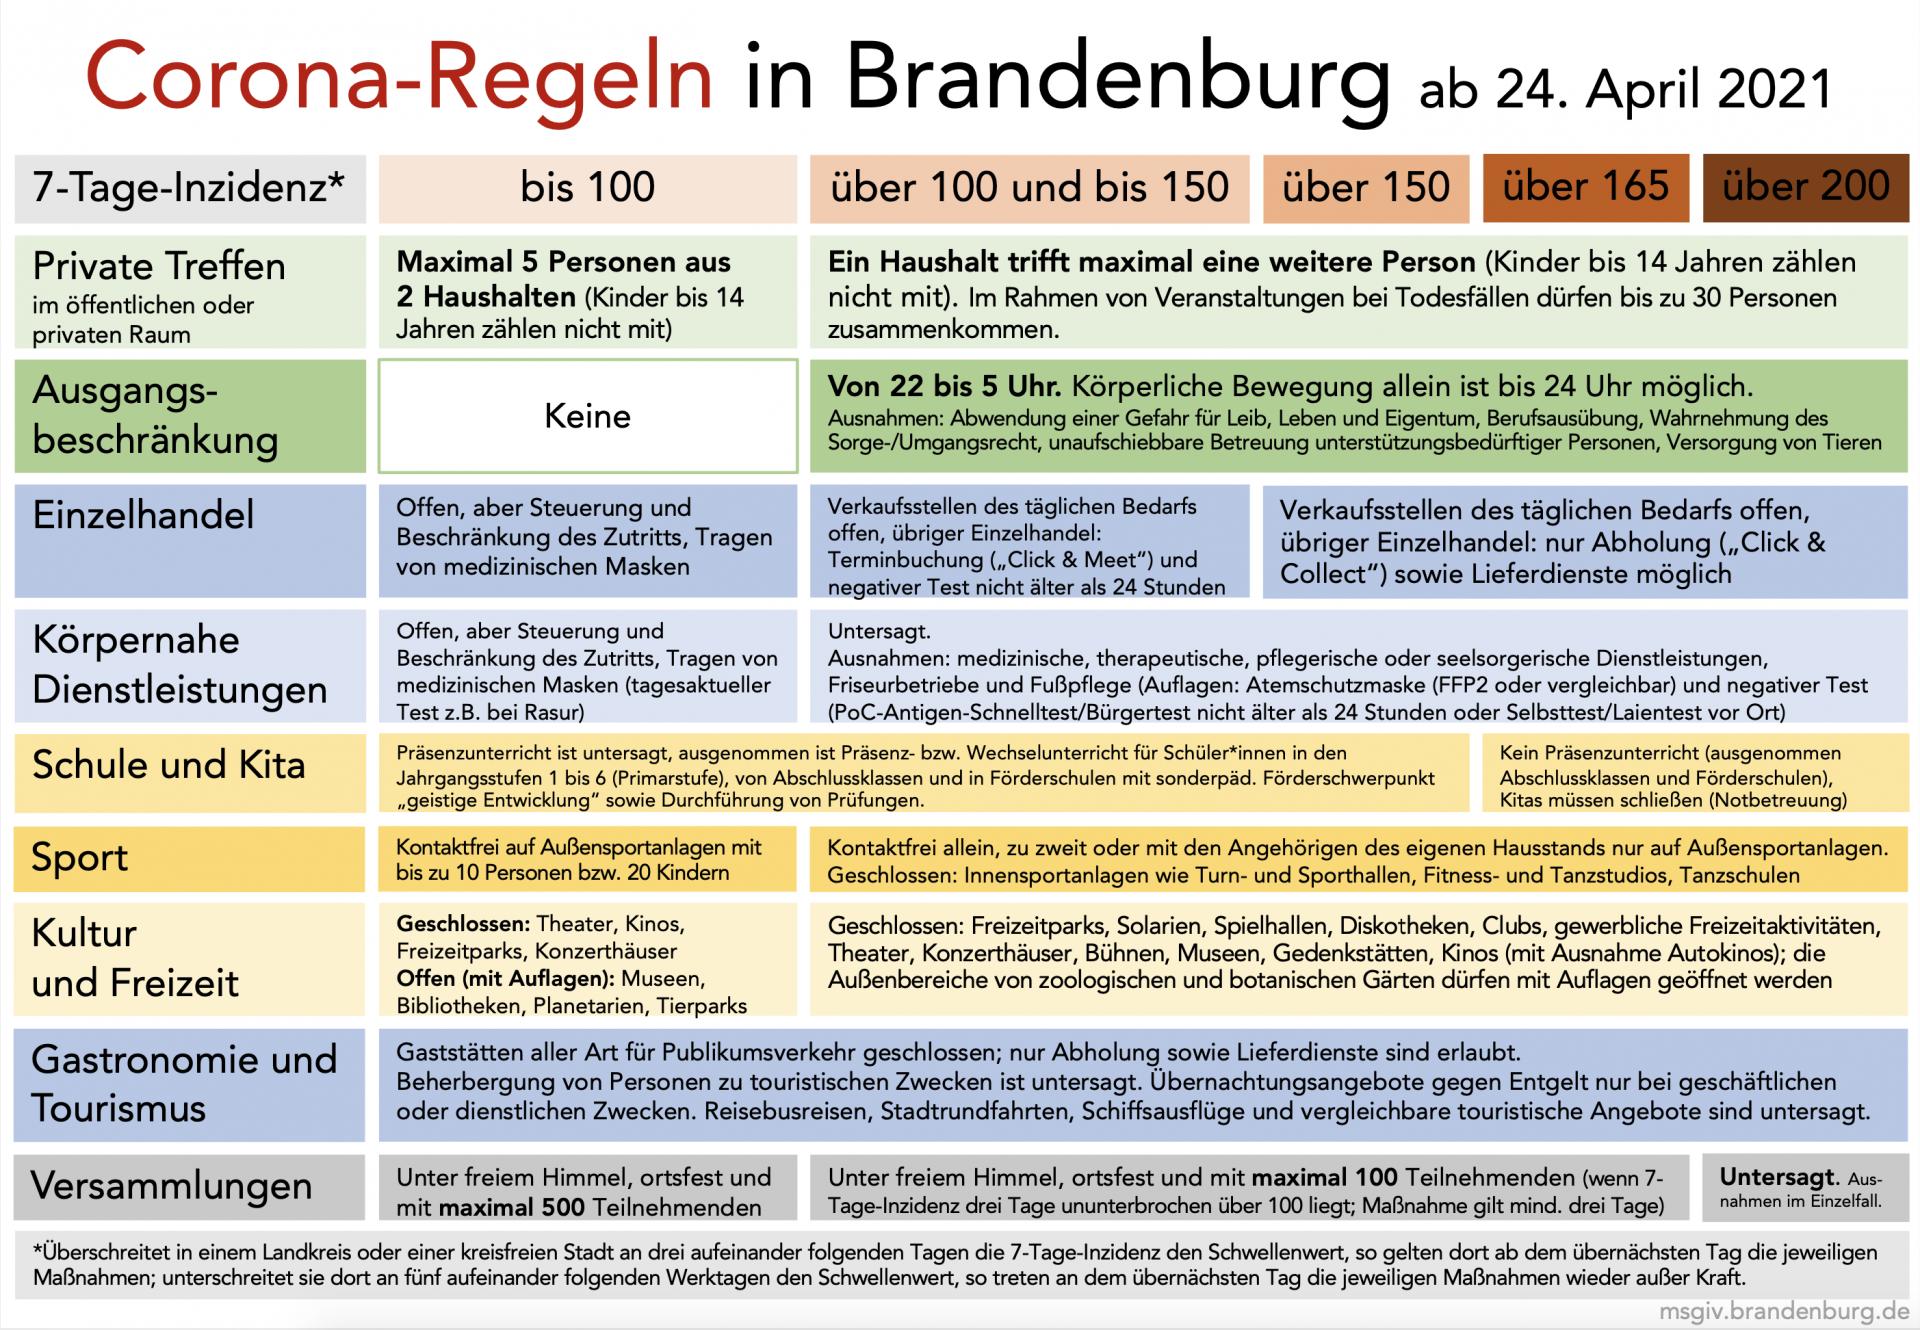 Grafik: Corona-Regeln in Brandenburg ab 24. April 2021